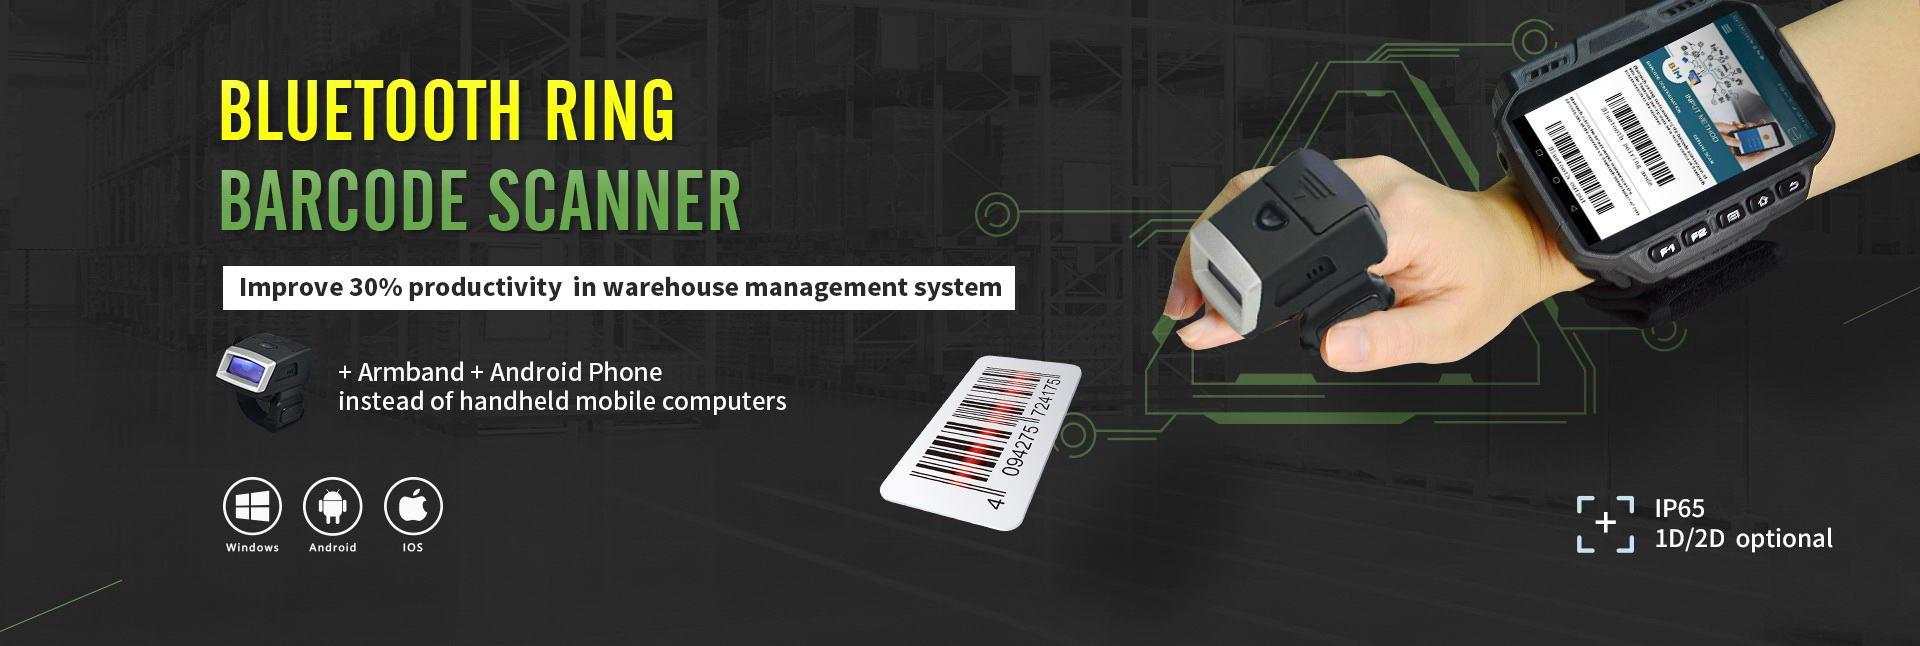 Barcode Scanner, Ring Barcode Scanner, Wireless Barcode